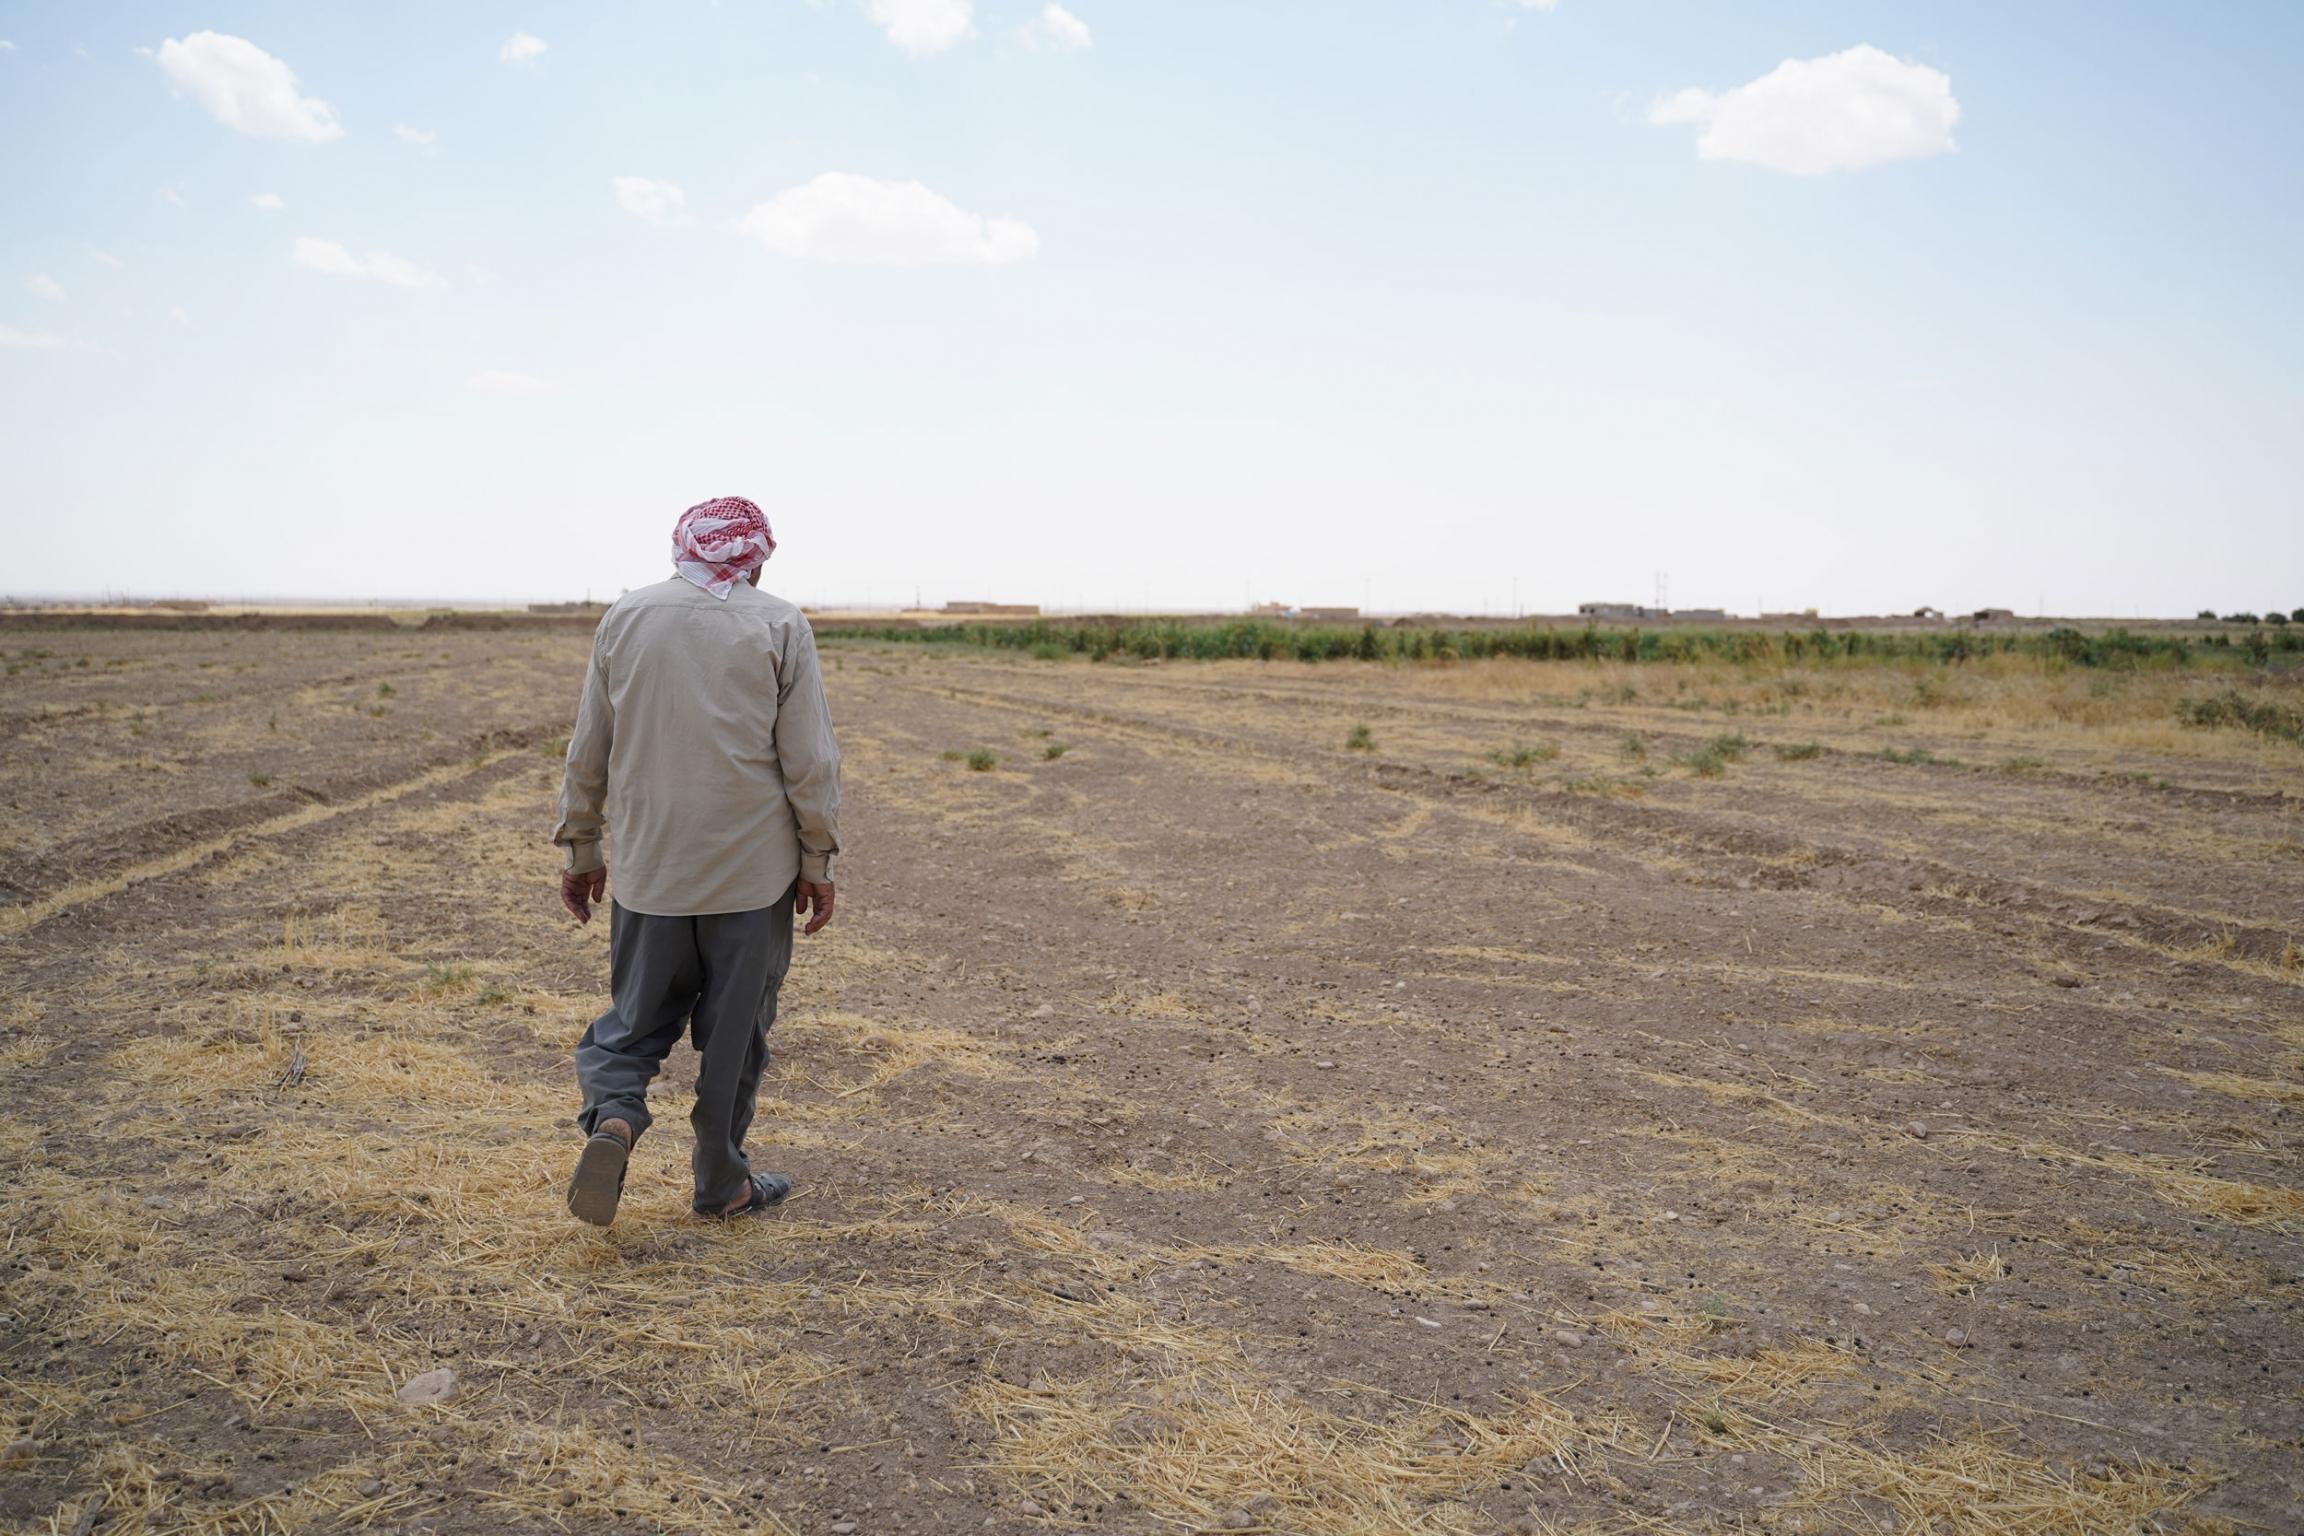 Haji Hassa, a Yazidi farmer from Kuri Jami village in Sinjar, August 2021.